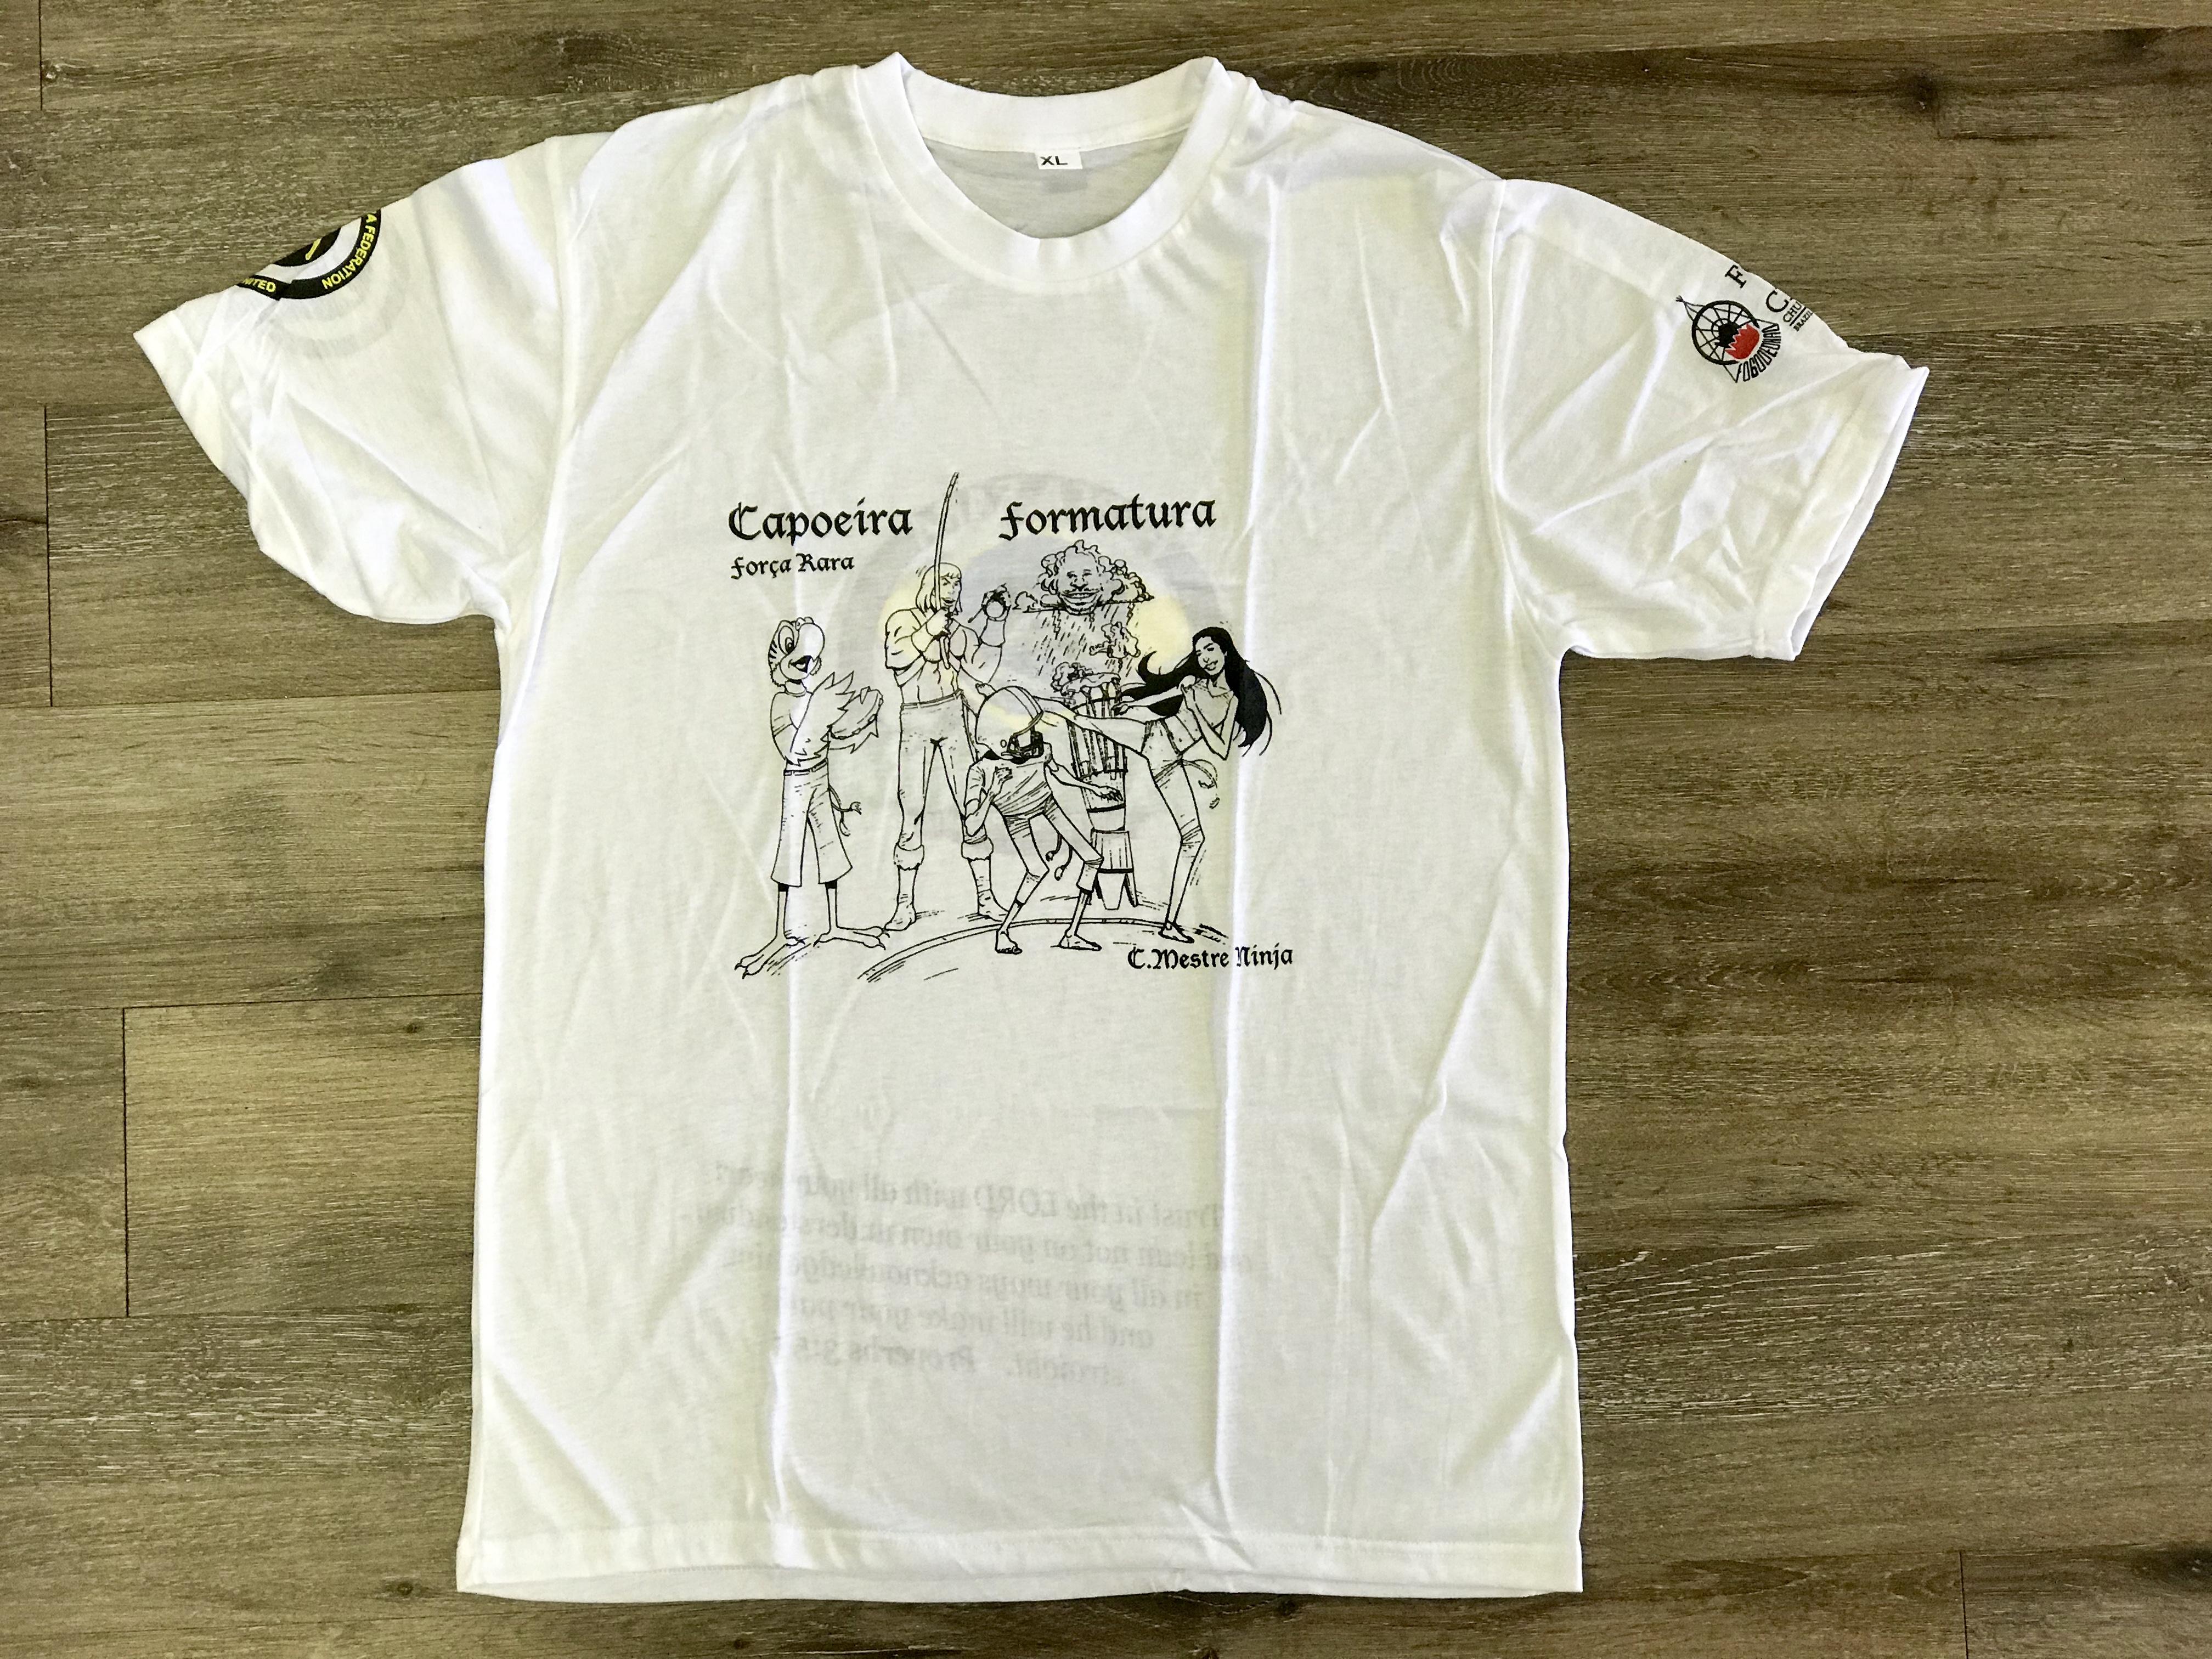 Event Shirts